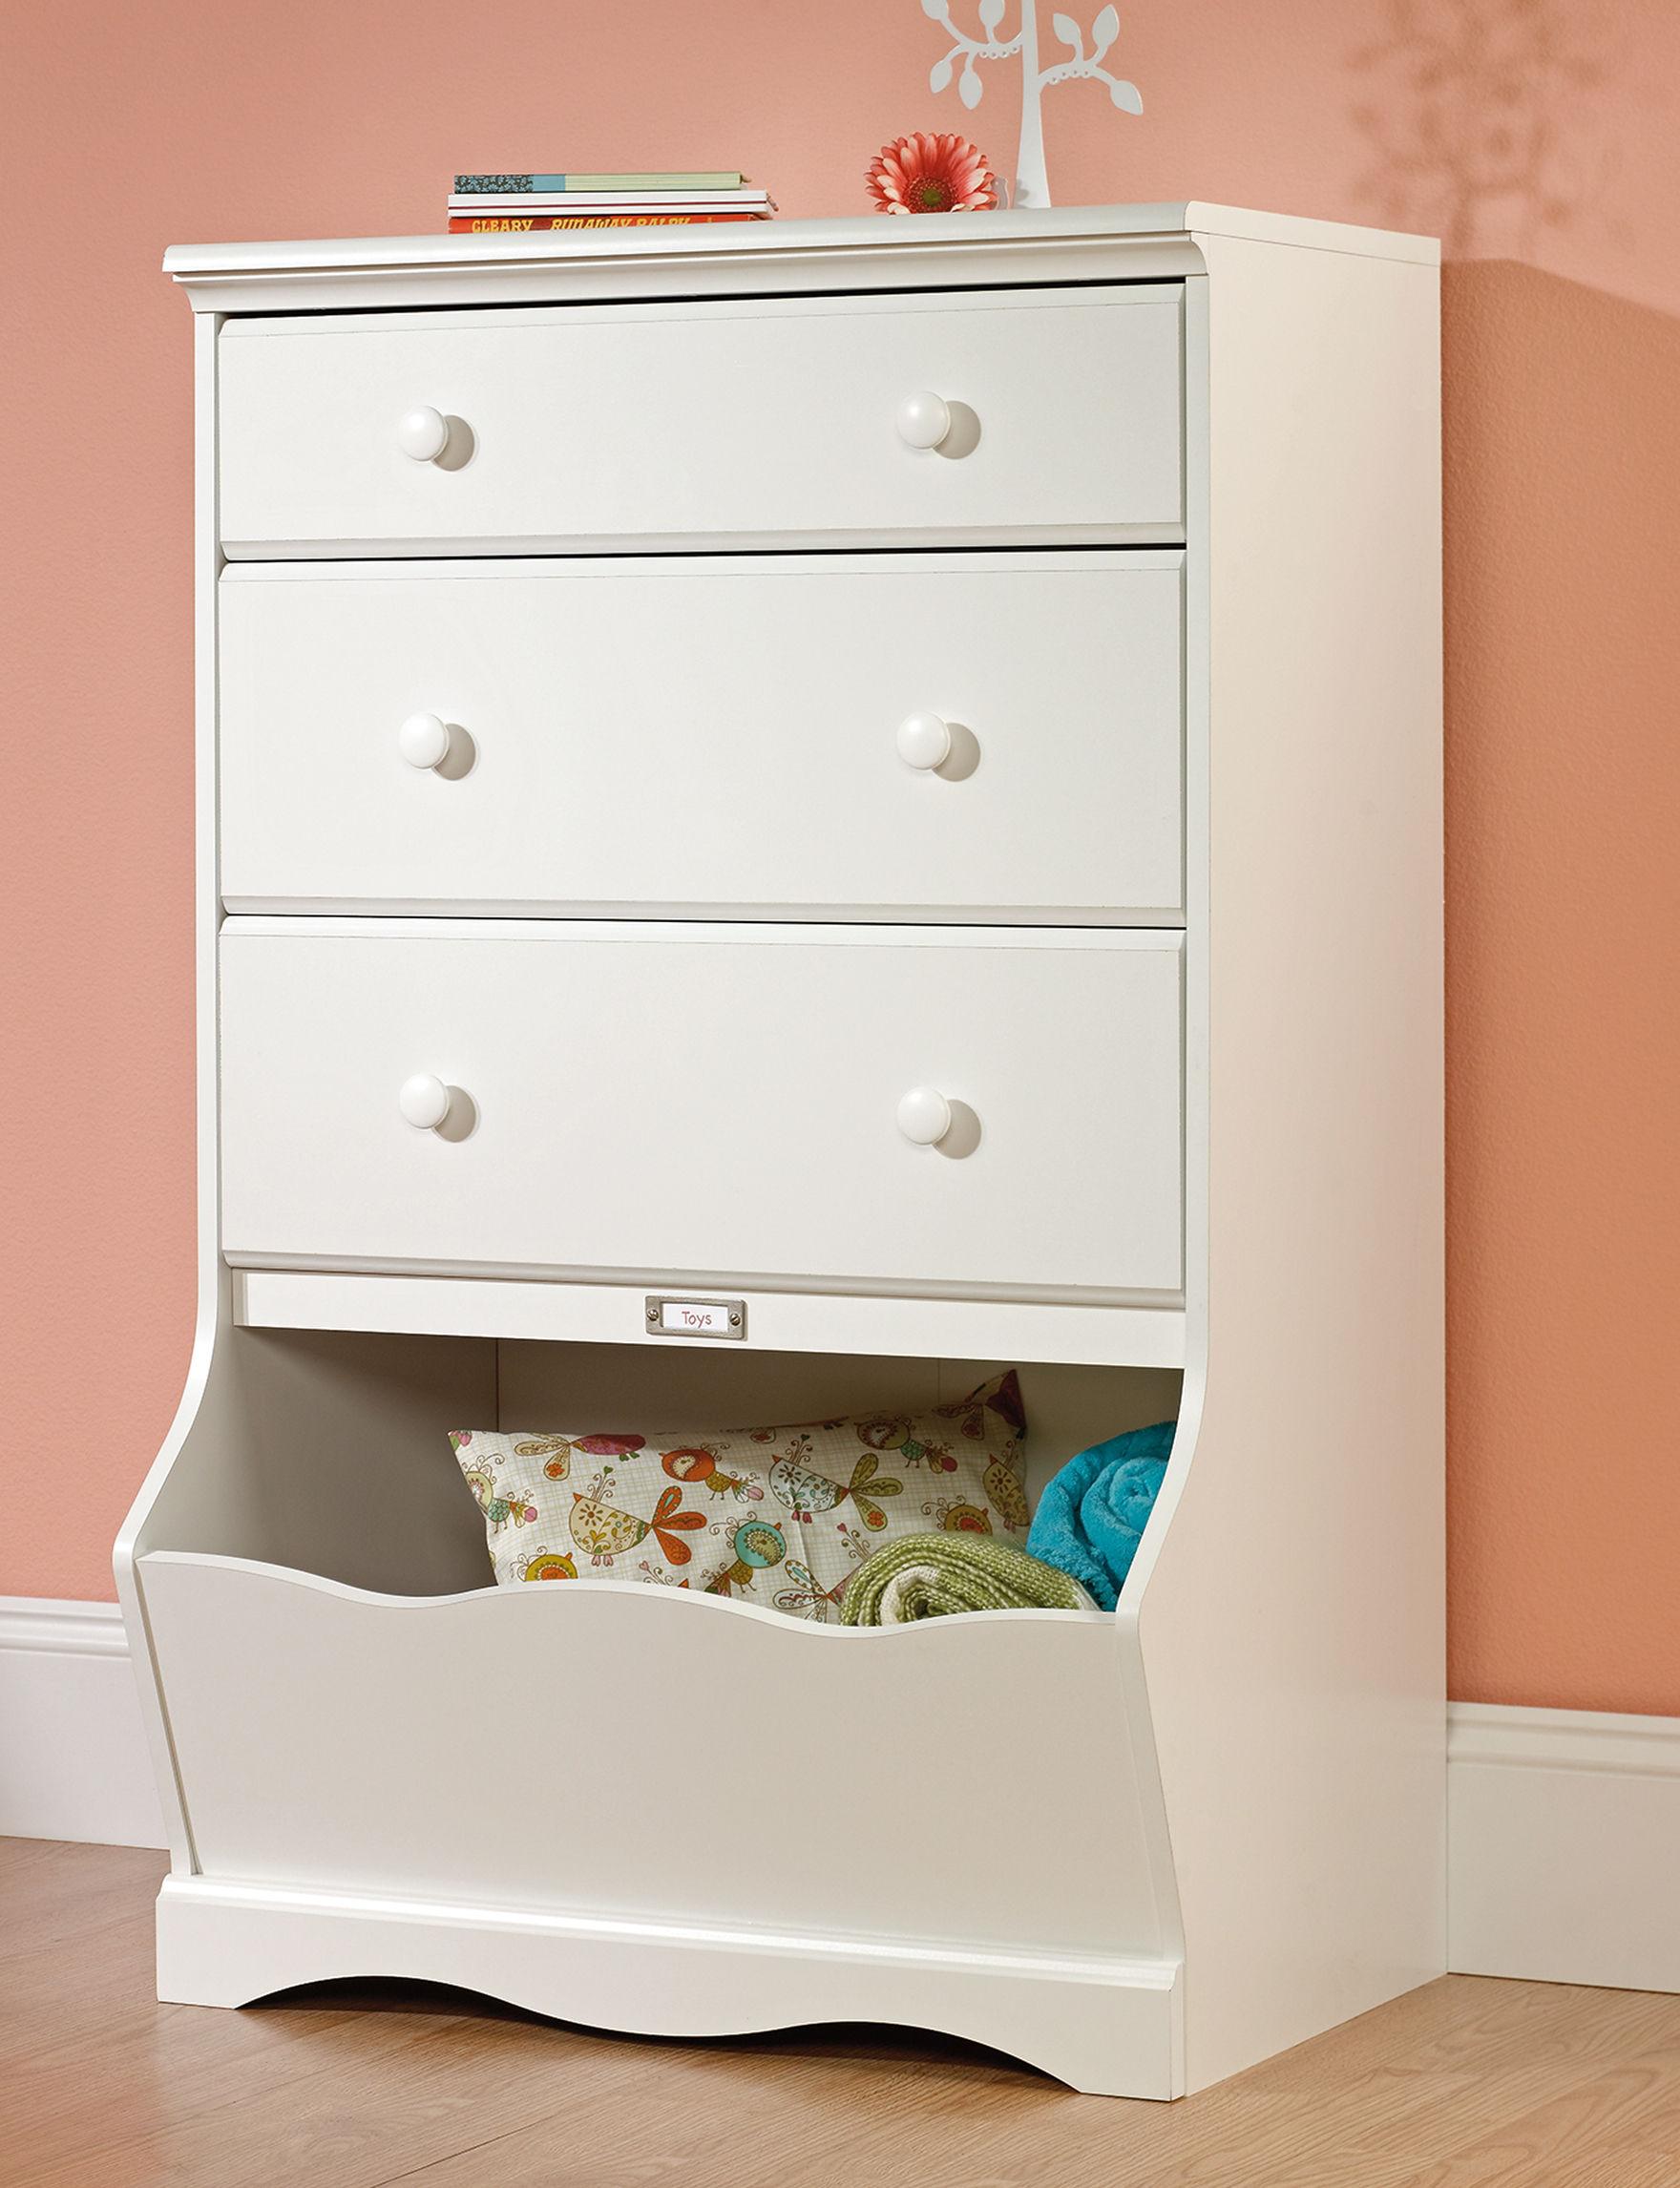 Sauder Off White Dressers & Chests Bedroom Furniture